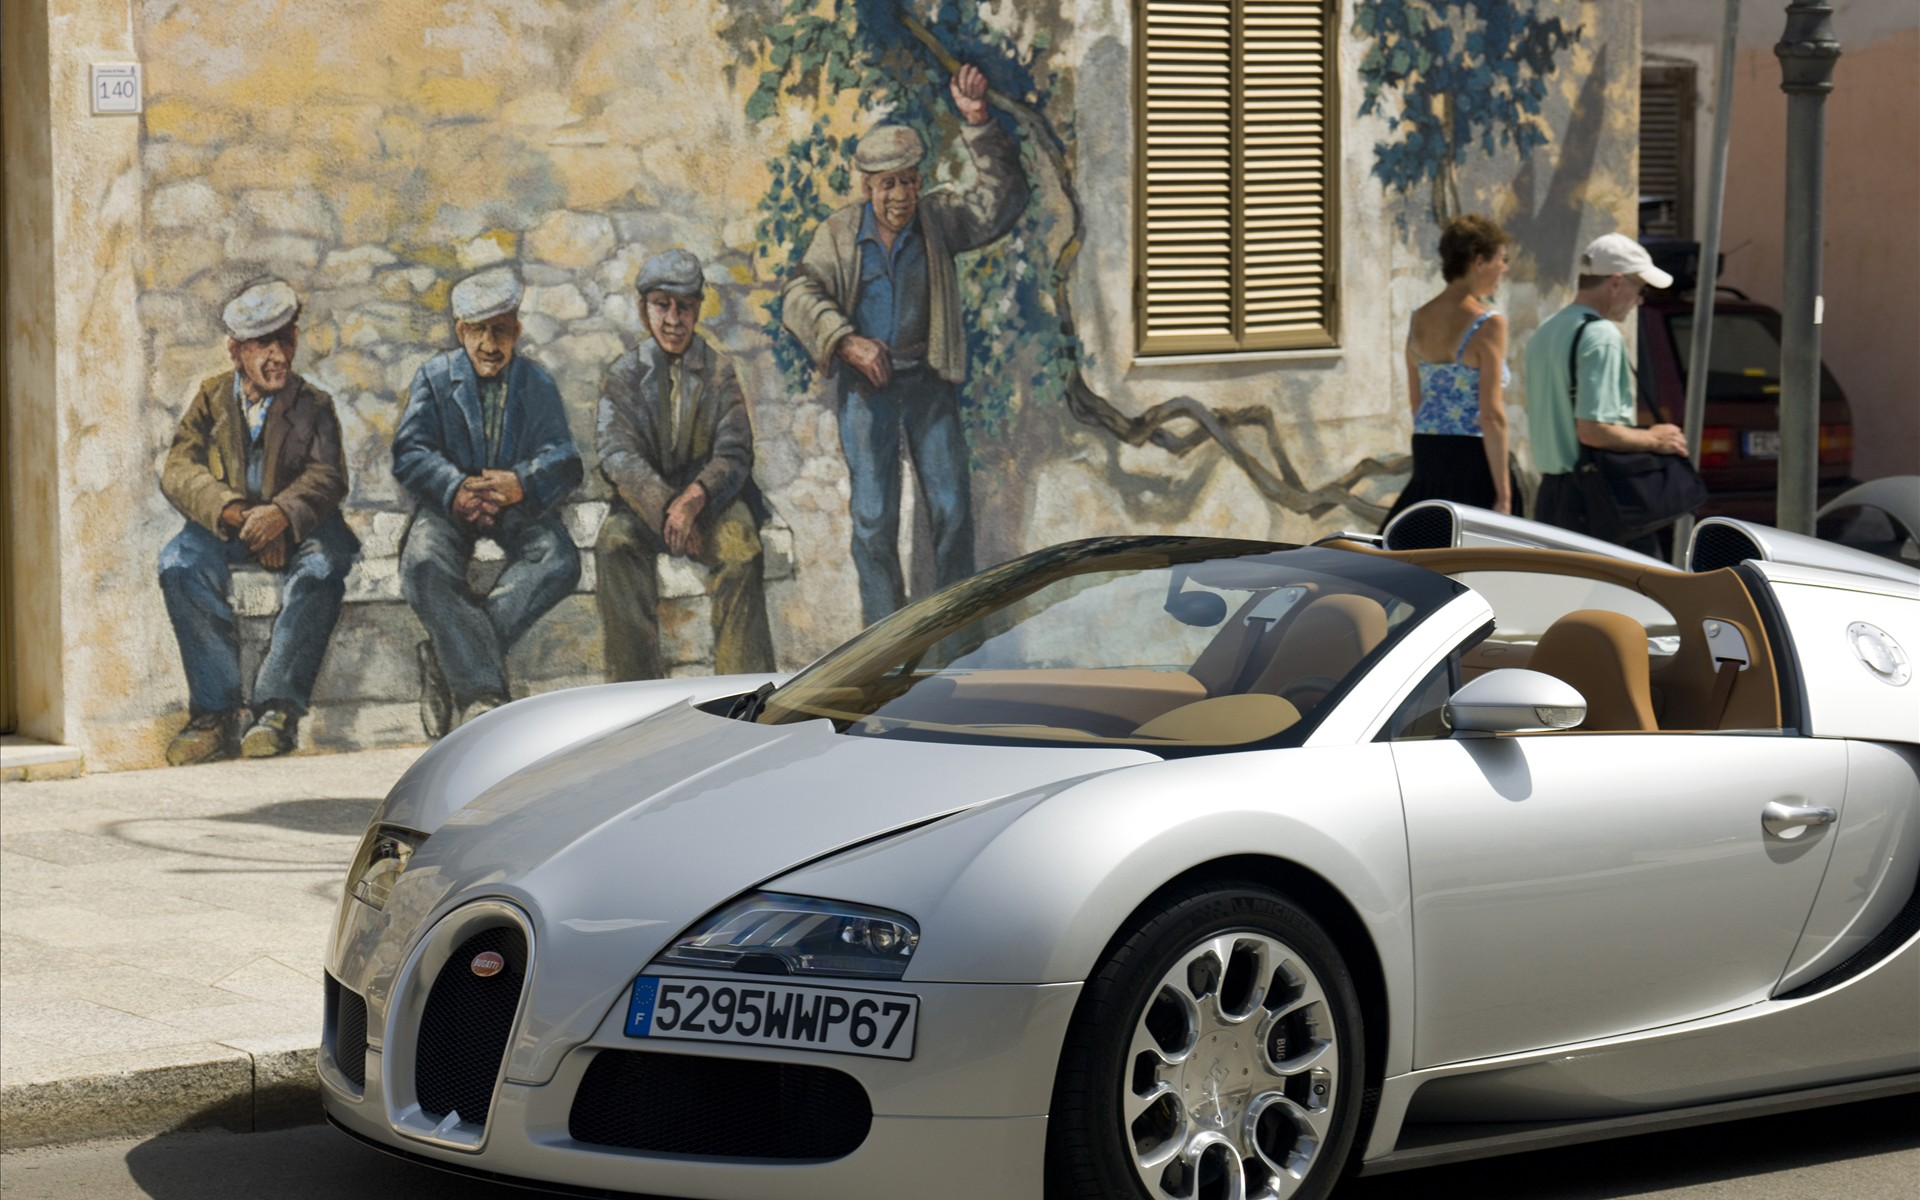 bugatti full hd wallpaper and background image 1920x1200. Black Bedroom Furniture Sets. Home Design Ideas